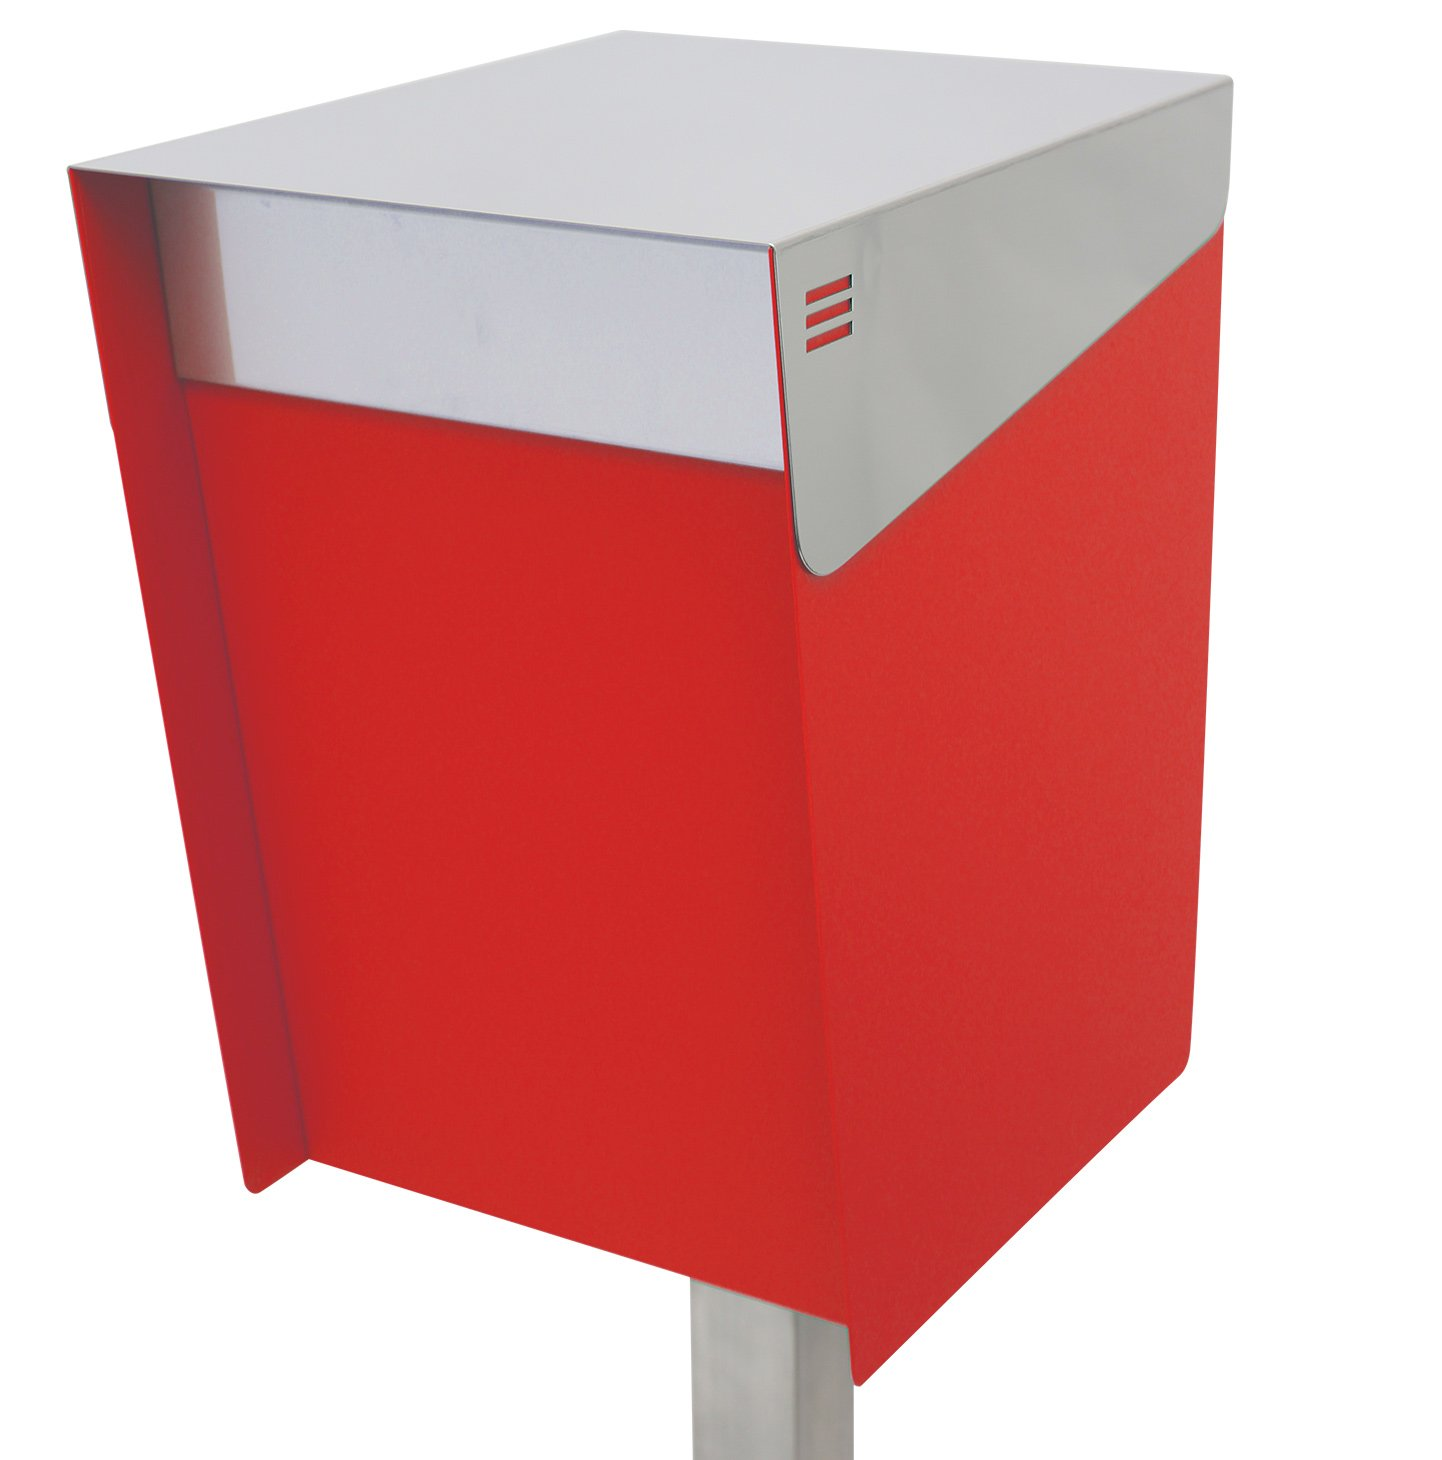 San Jose(サンノゼ) トール 郵便ポスト ポール付き スタンド型 ステンレス製 鍵付き おしゃれ 大型 アメリカンポスト 大容量 郵便受け 99.9% 防水構造 日本製 レッド B01ARPXPMC レッド レッド